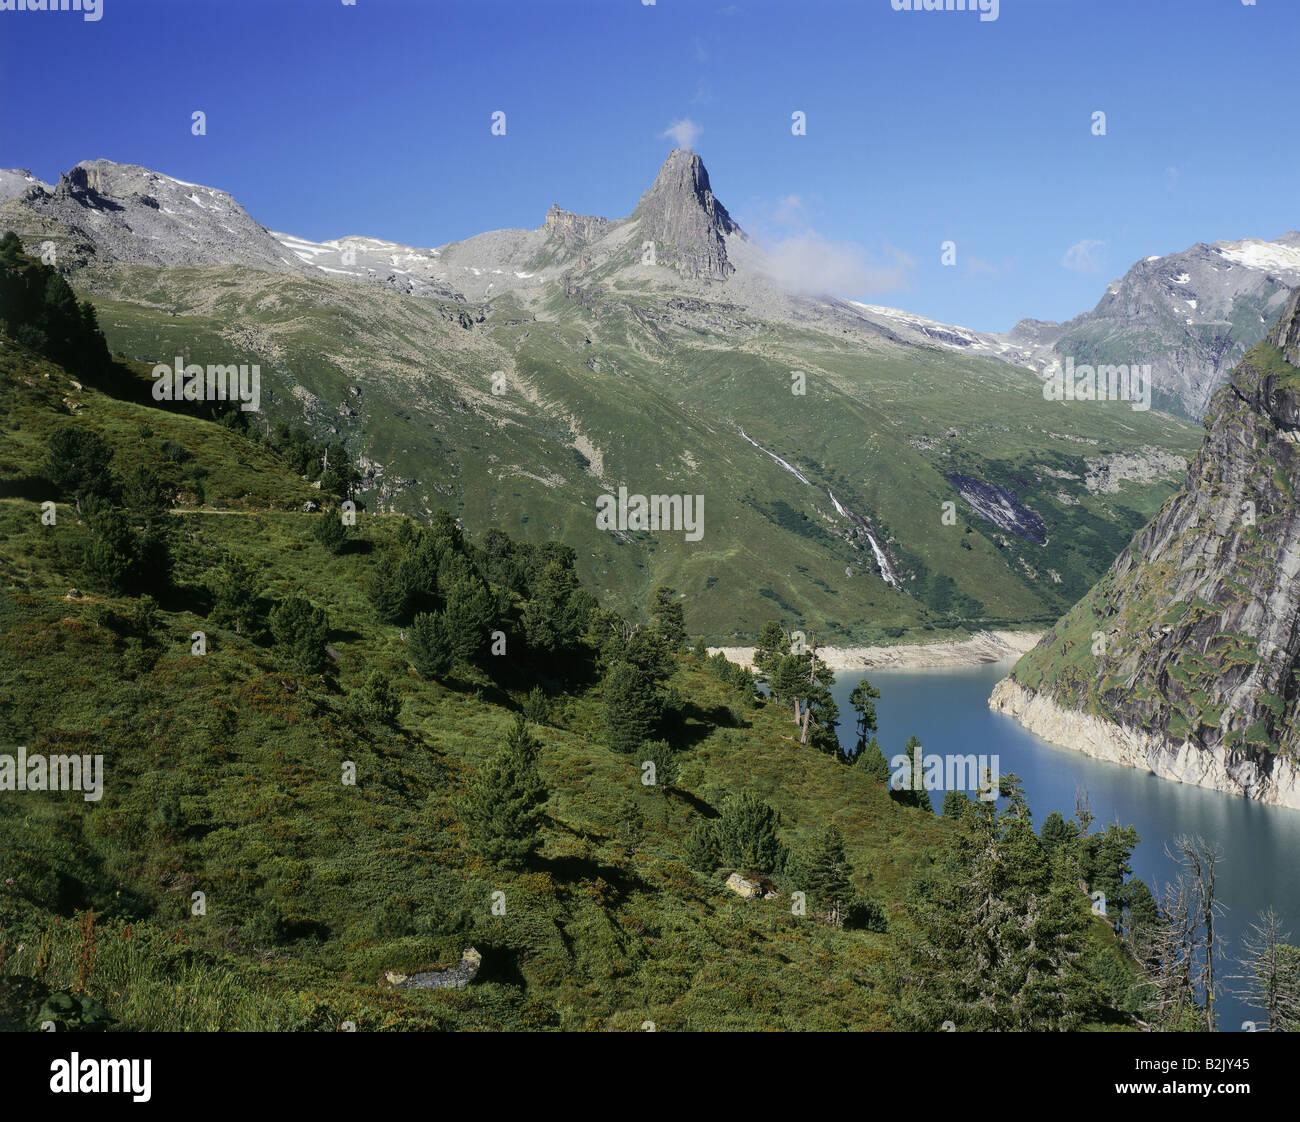 Travel Geography: Zevreilahorn Stock Photos & Zevreilahorn Stock Images